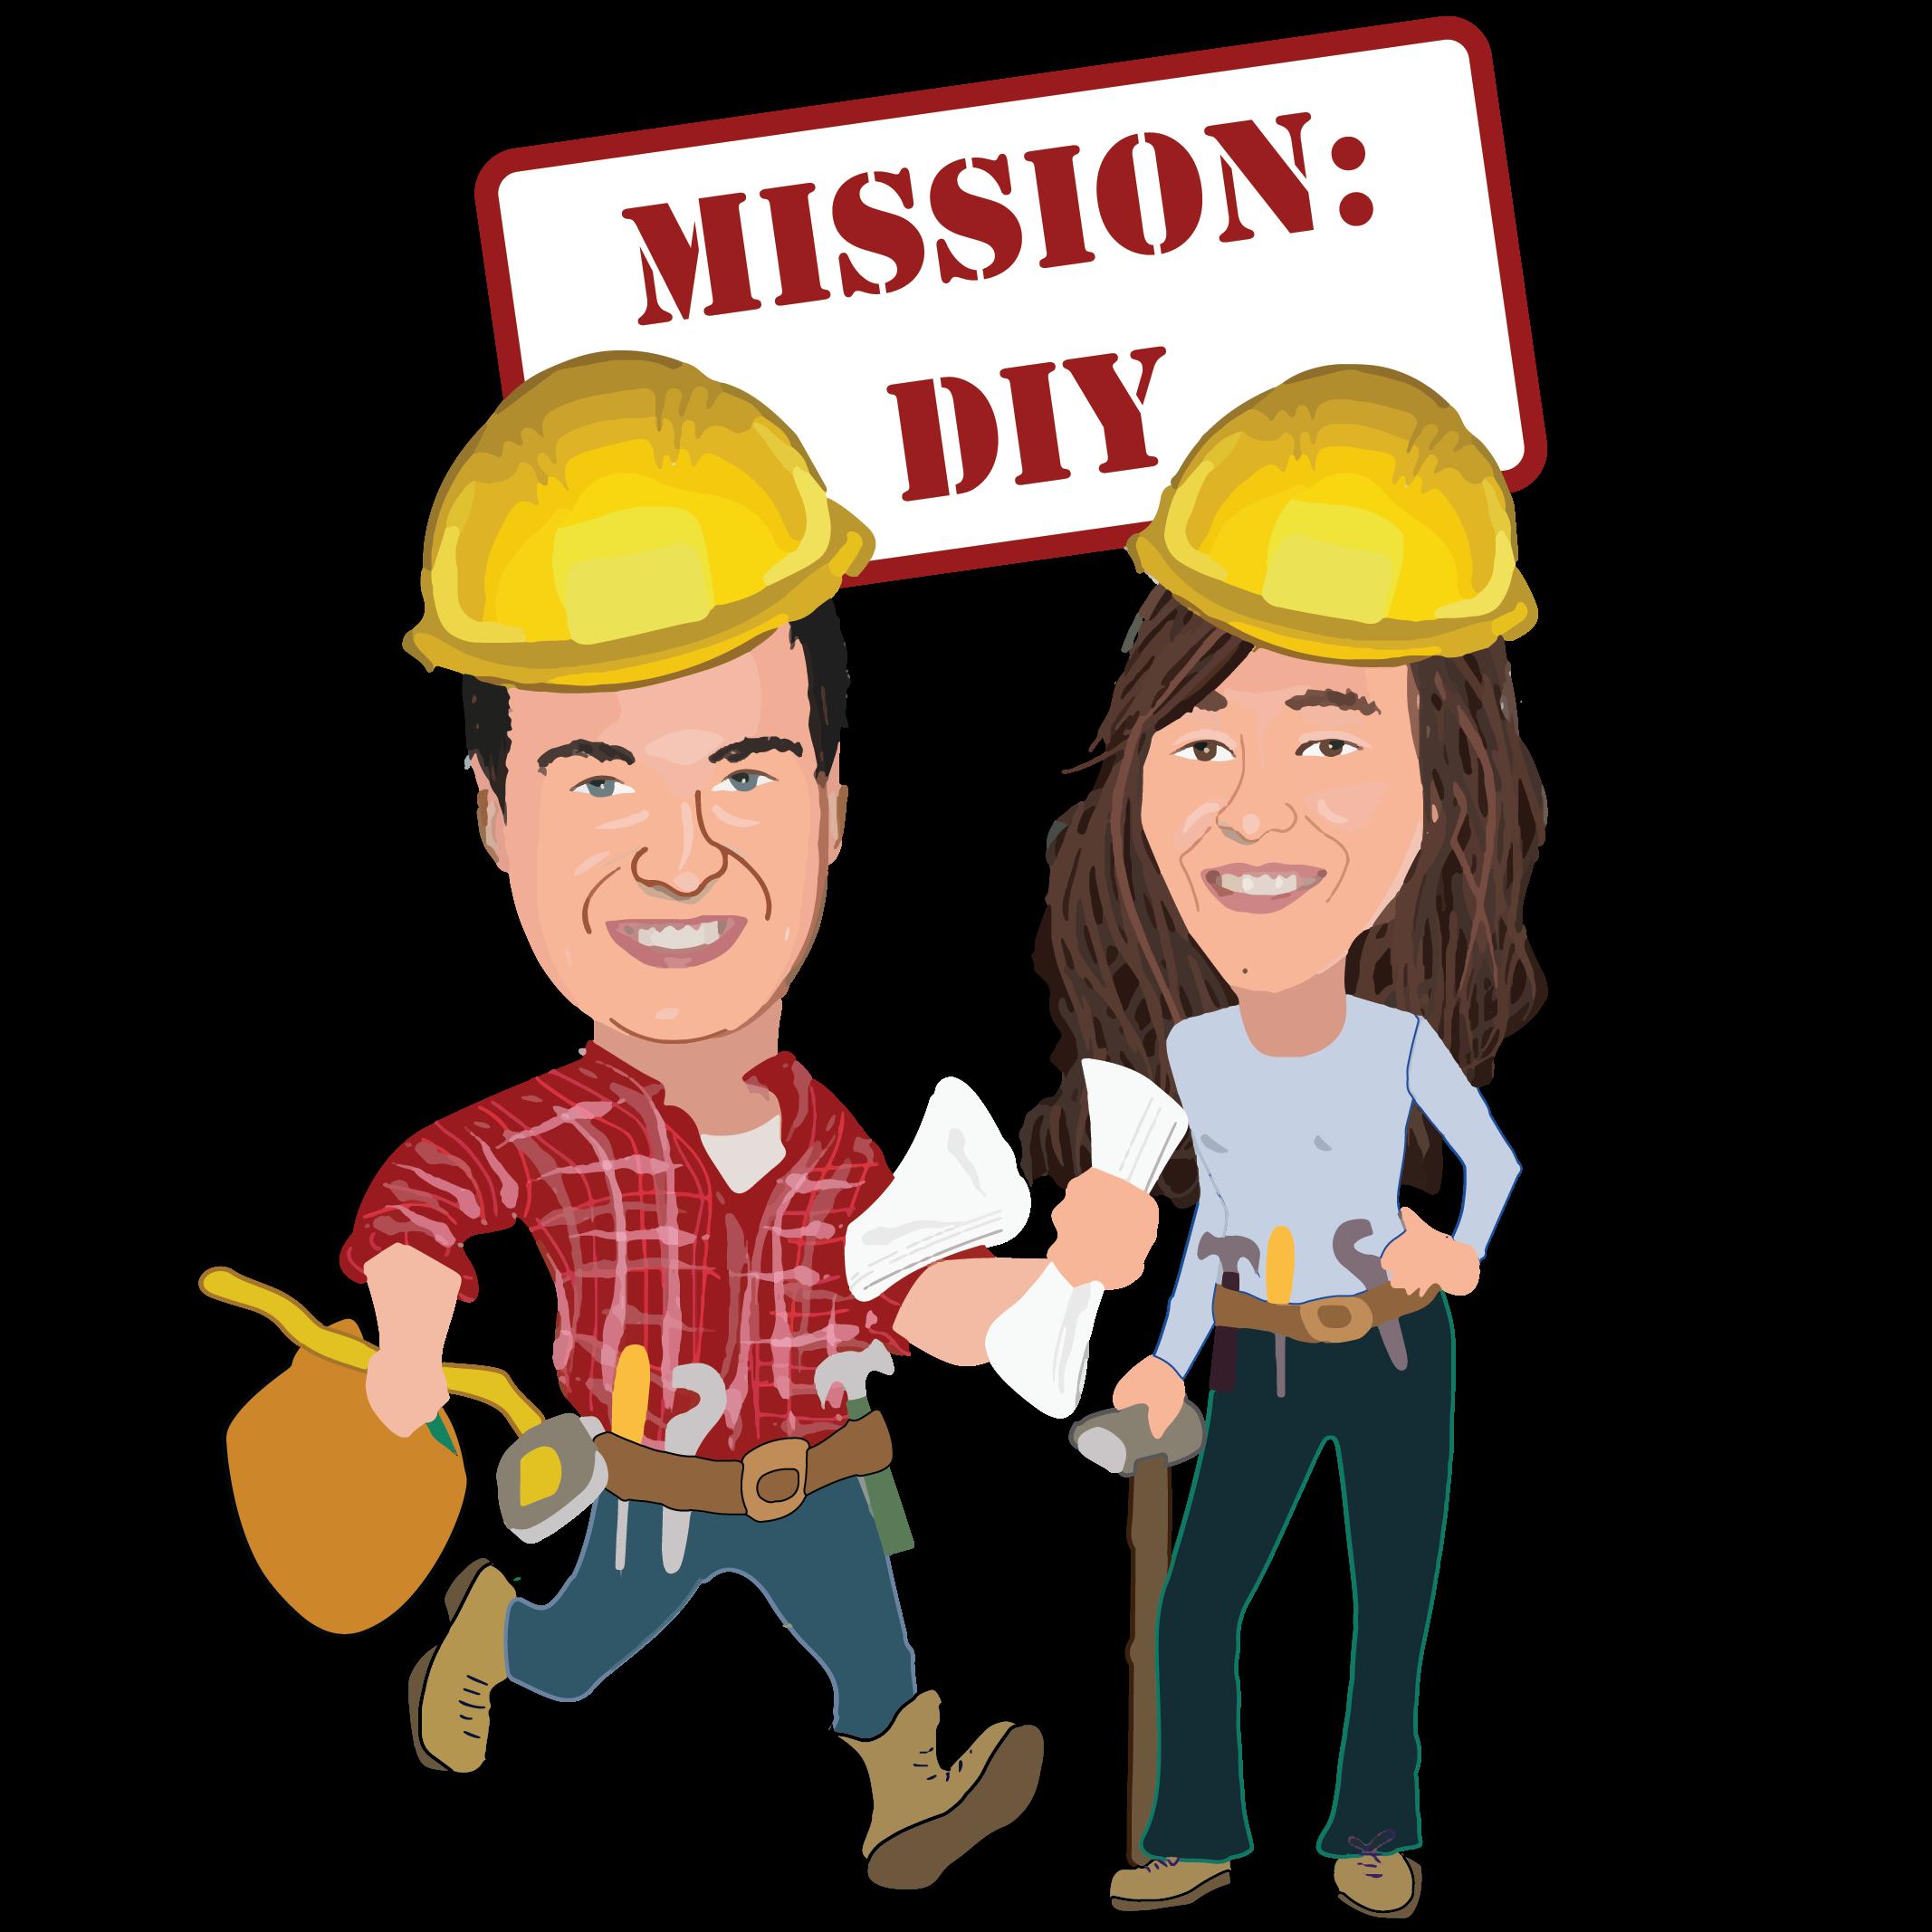 Mission DIY